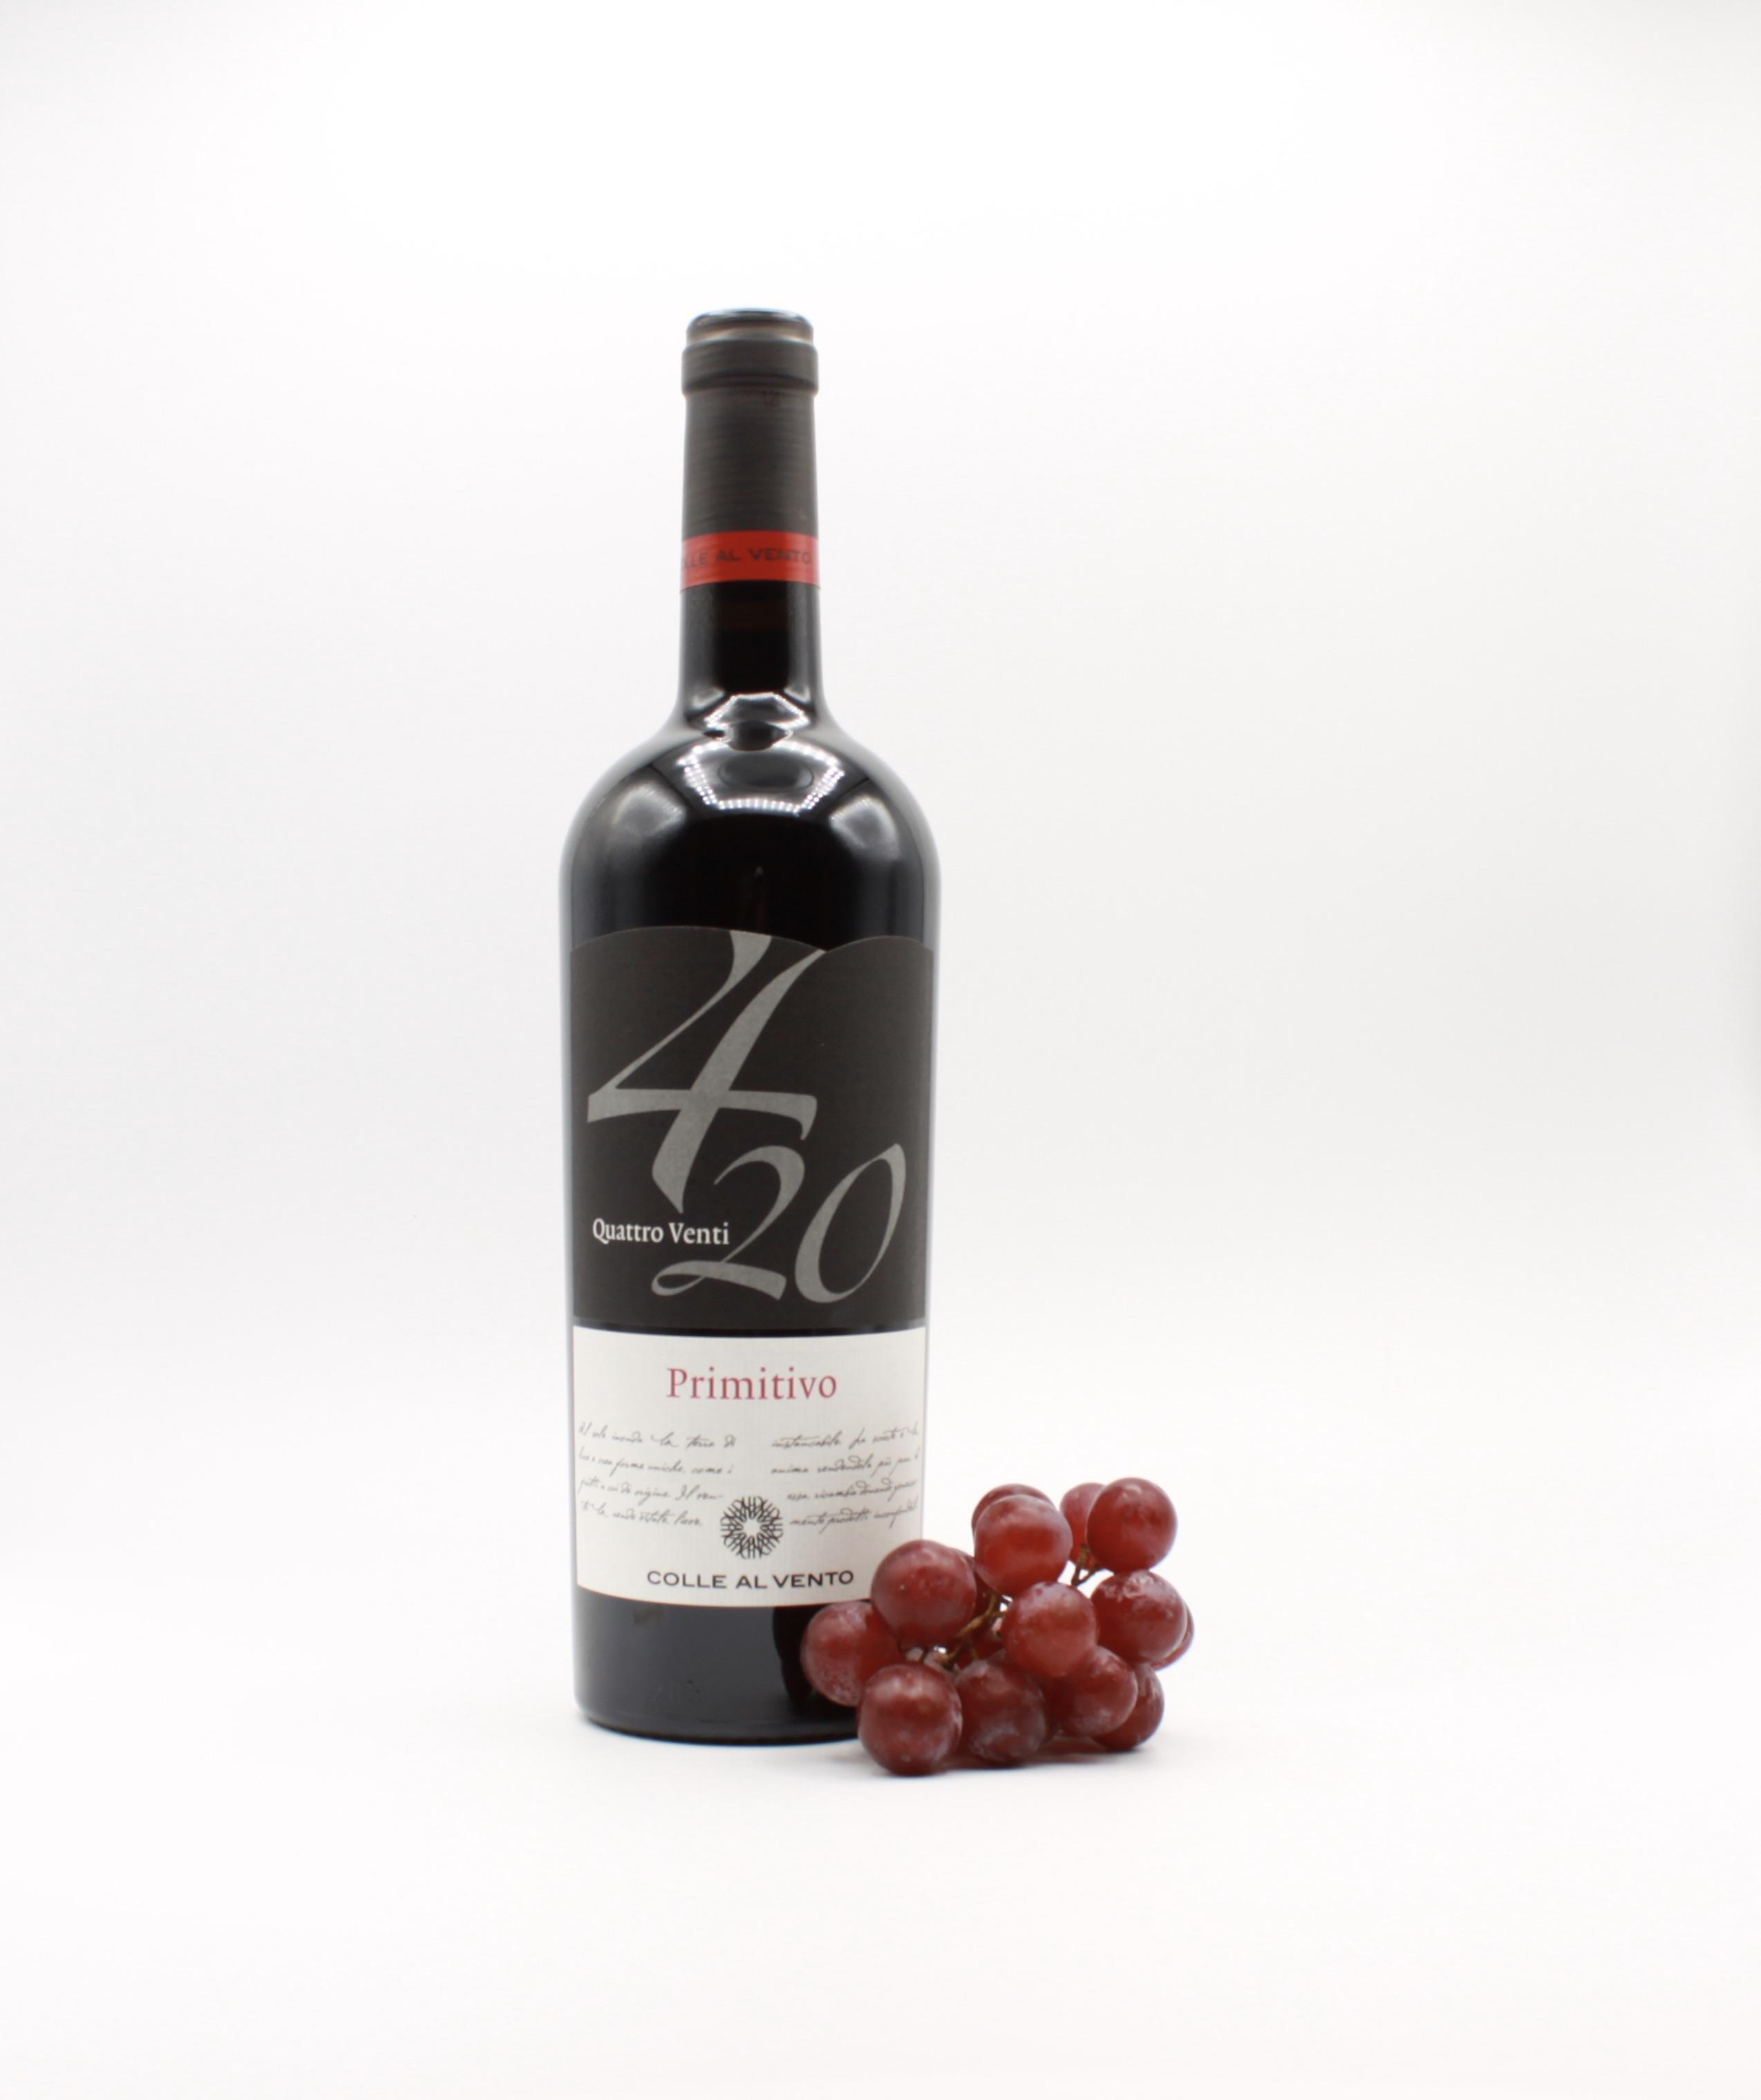 Primitivo Salento IGP 4/20 - Colle al Vento, Italienischer Rotwein